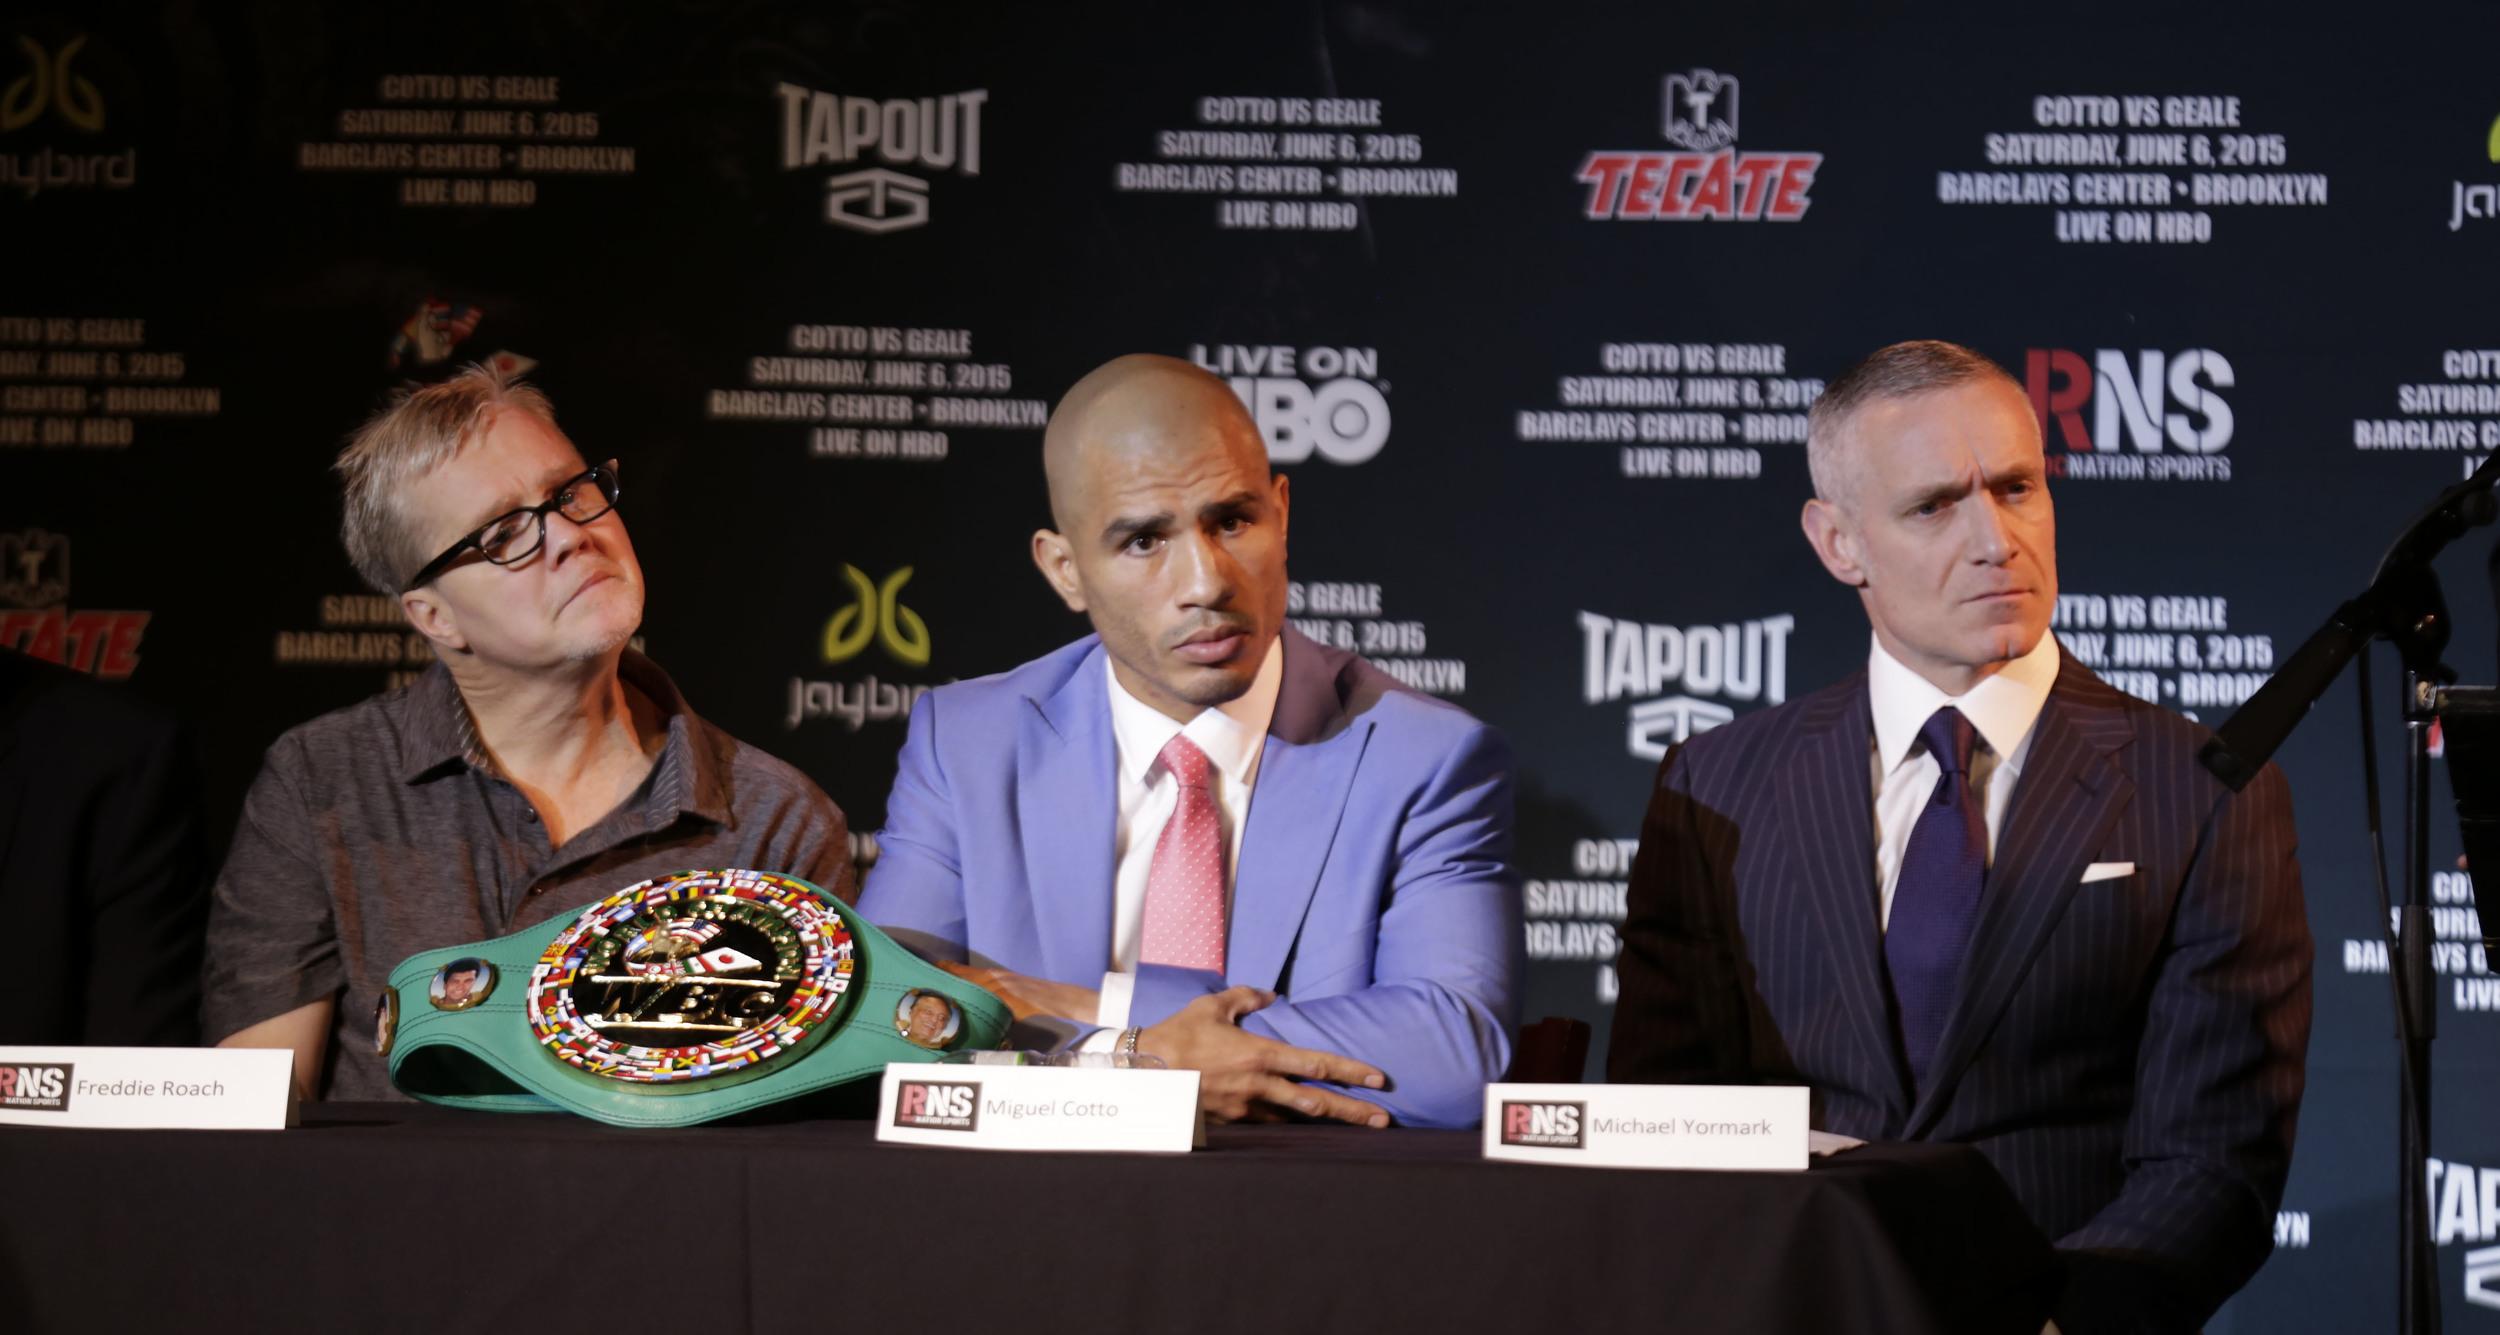 Press Conference Cotto vs Geale 09 (2).JPG